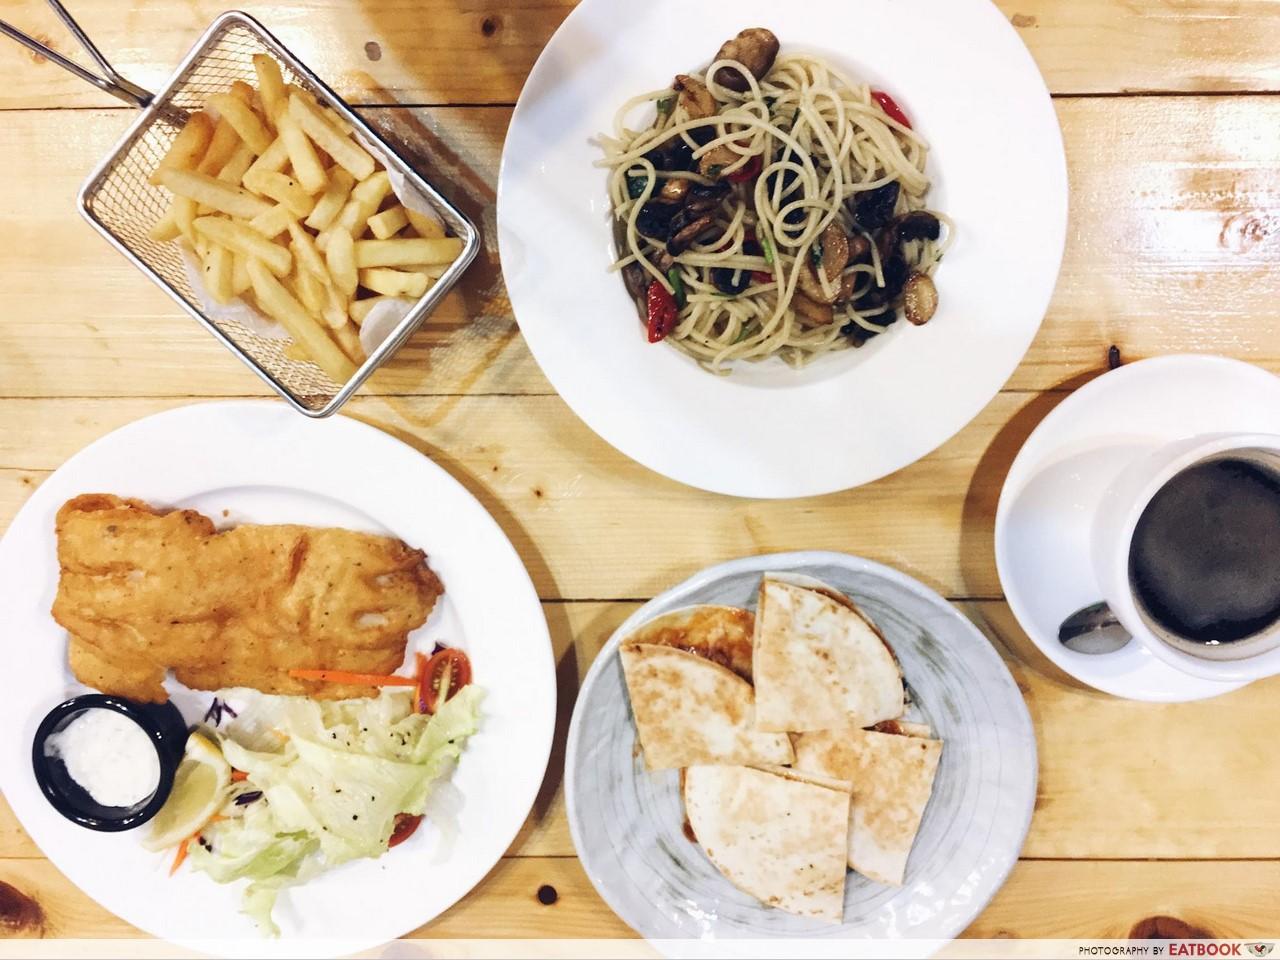 jurong cafes - next stop cafe